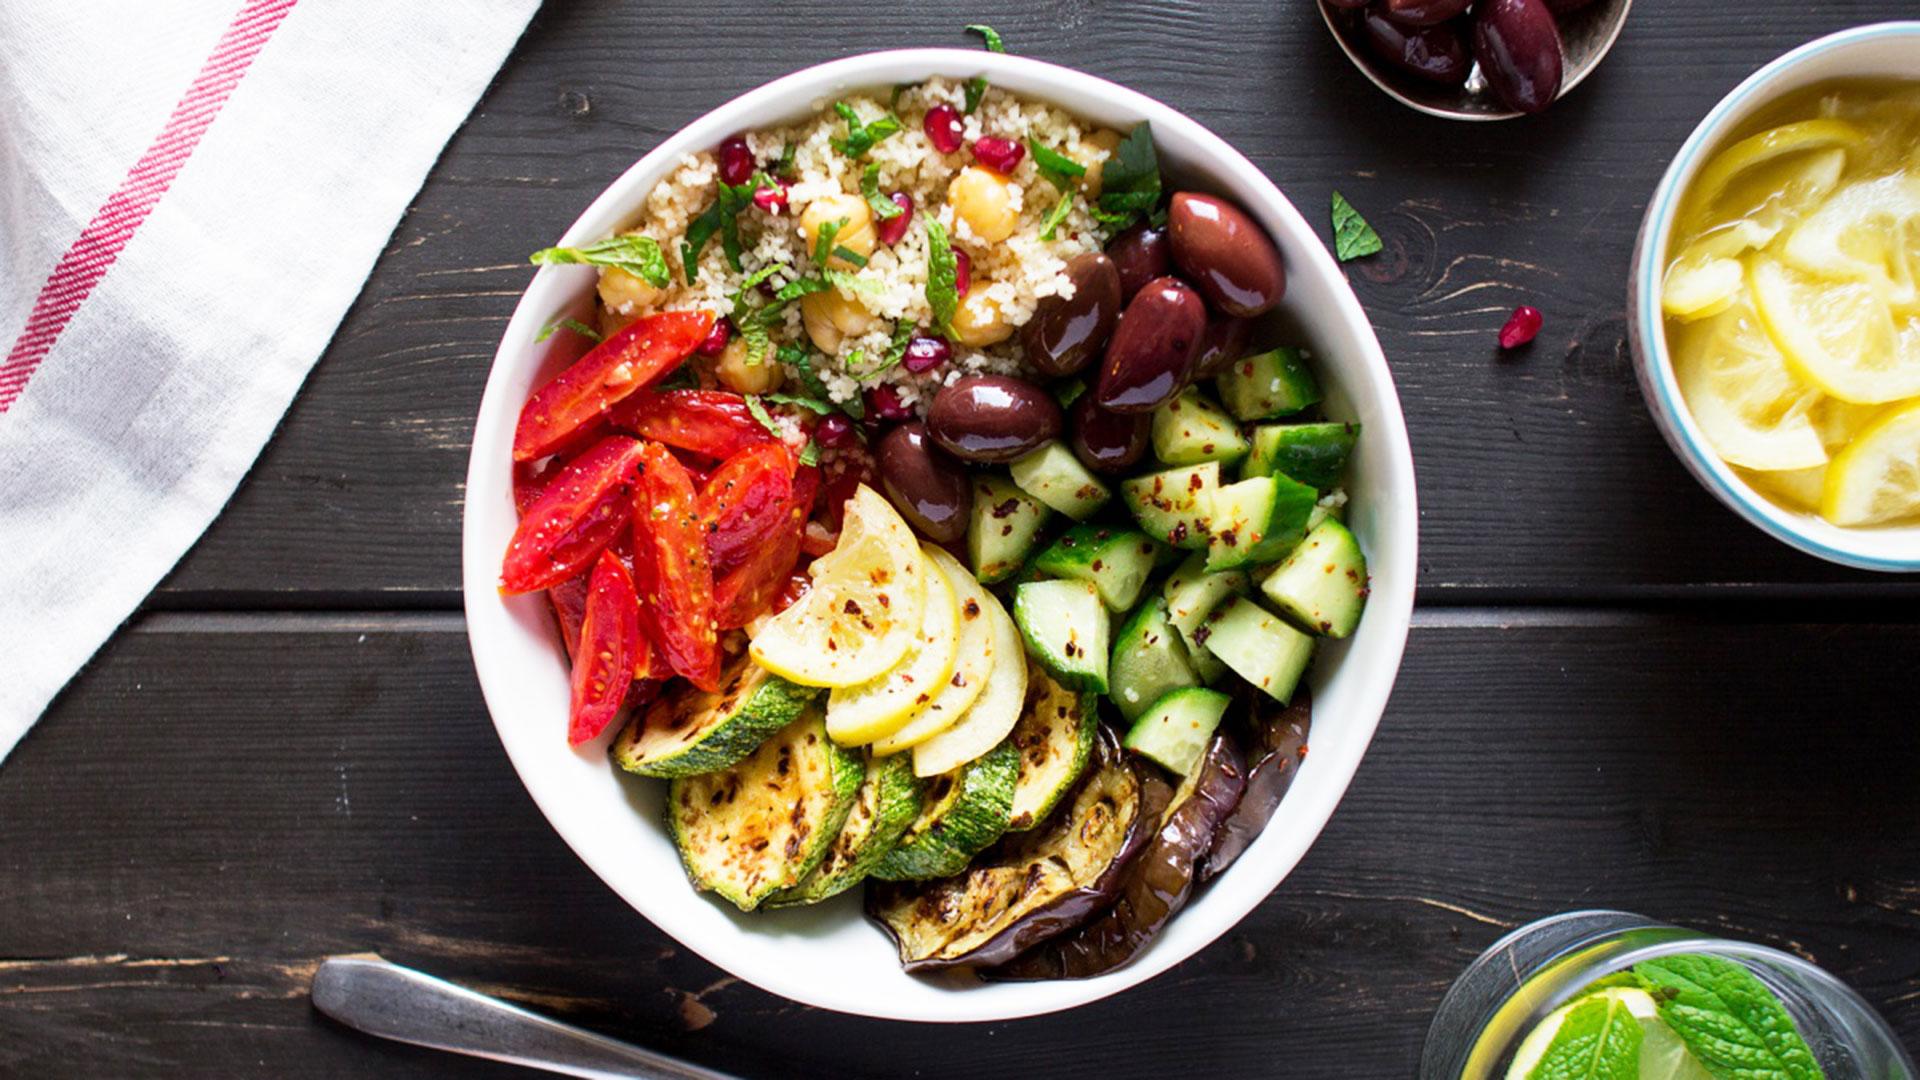 STYLECASTER | Winter Salad Recipes